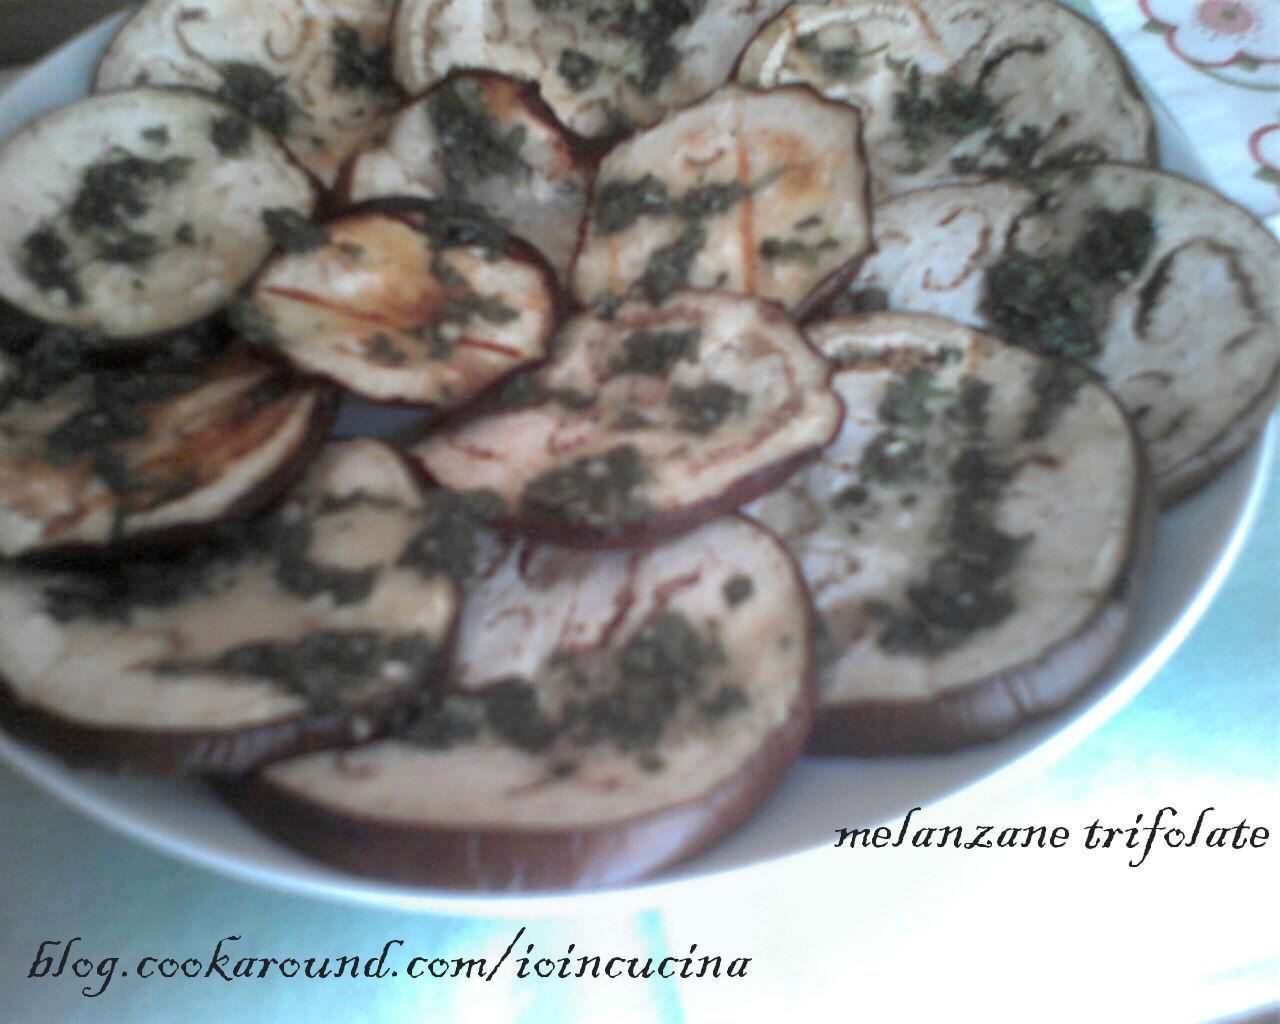 melanzane trifolate